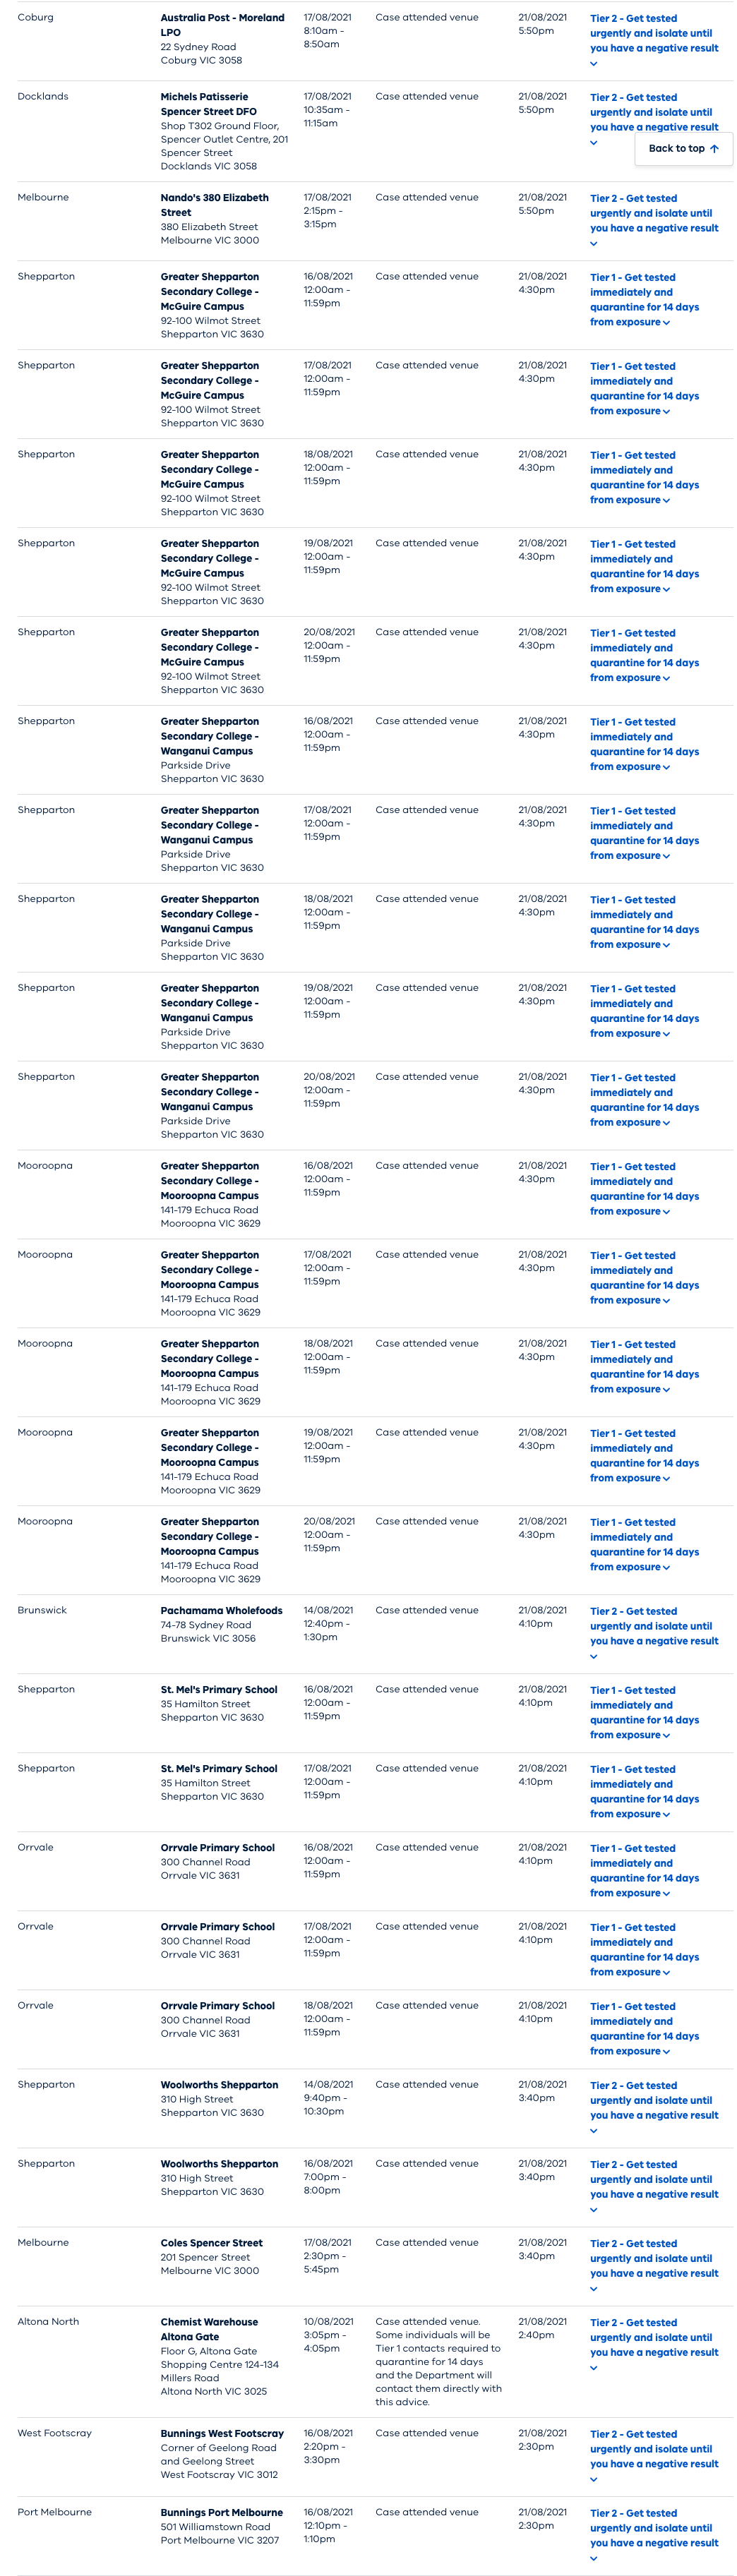 www.coronavirus.vic.gov.au_exposure-sites (29).png